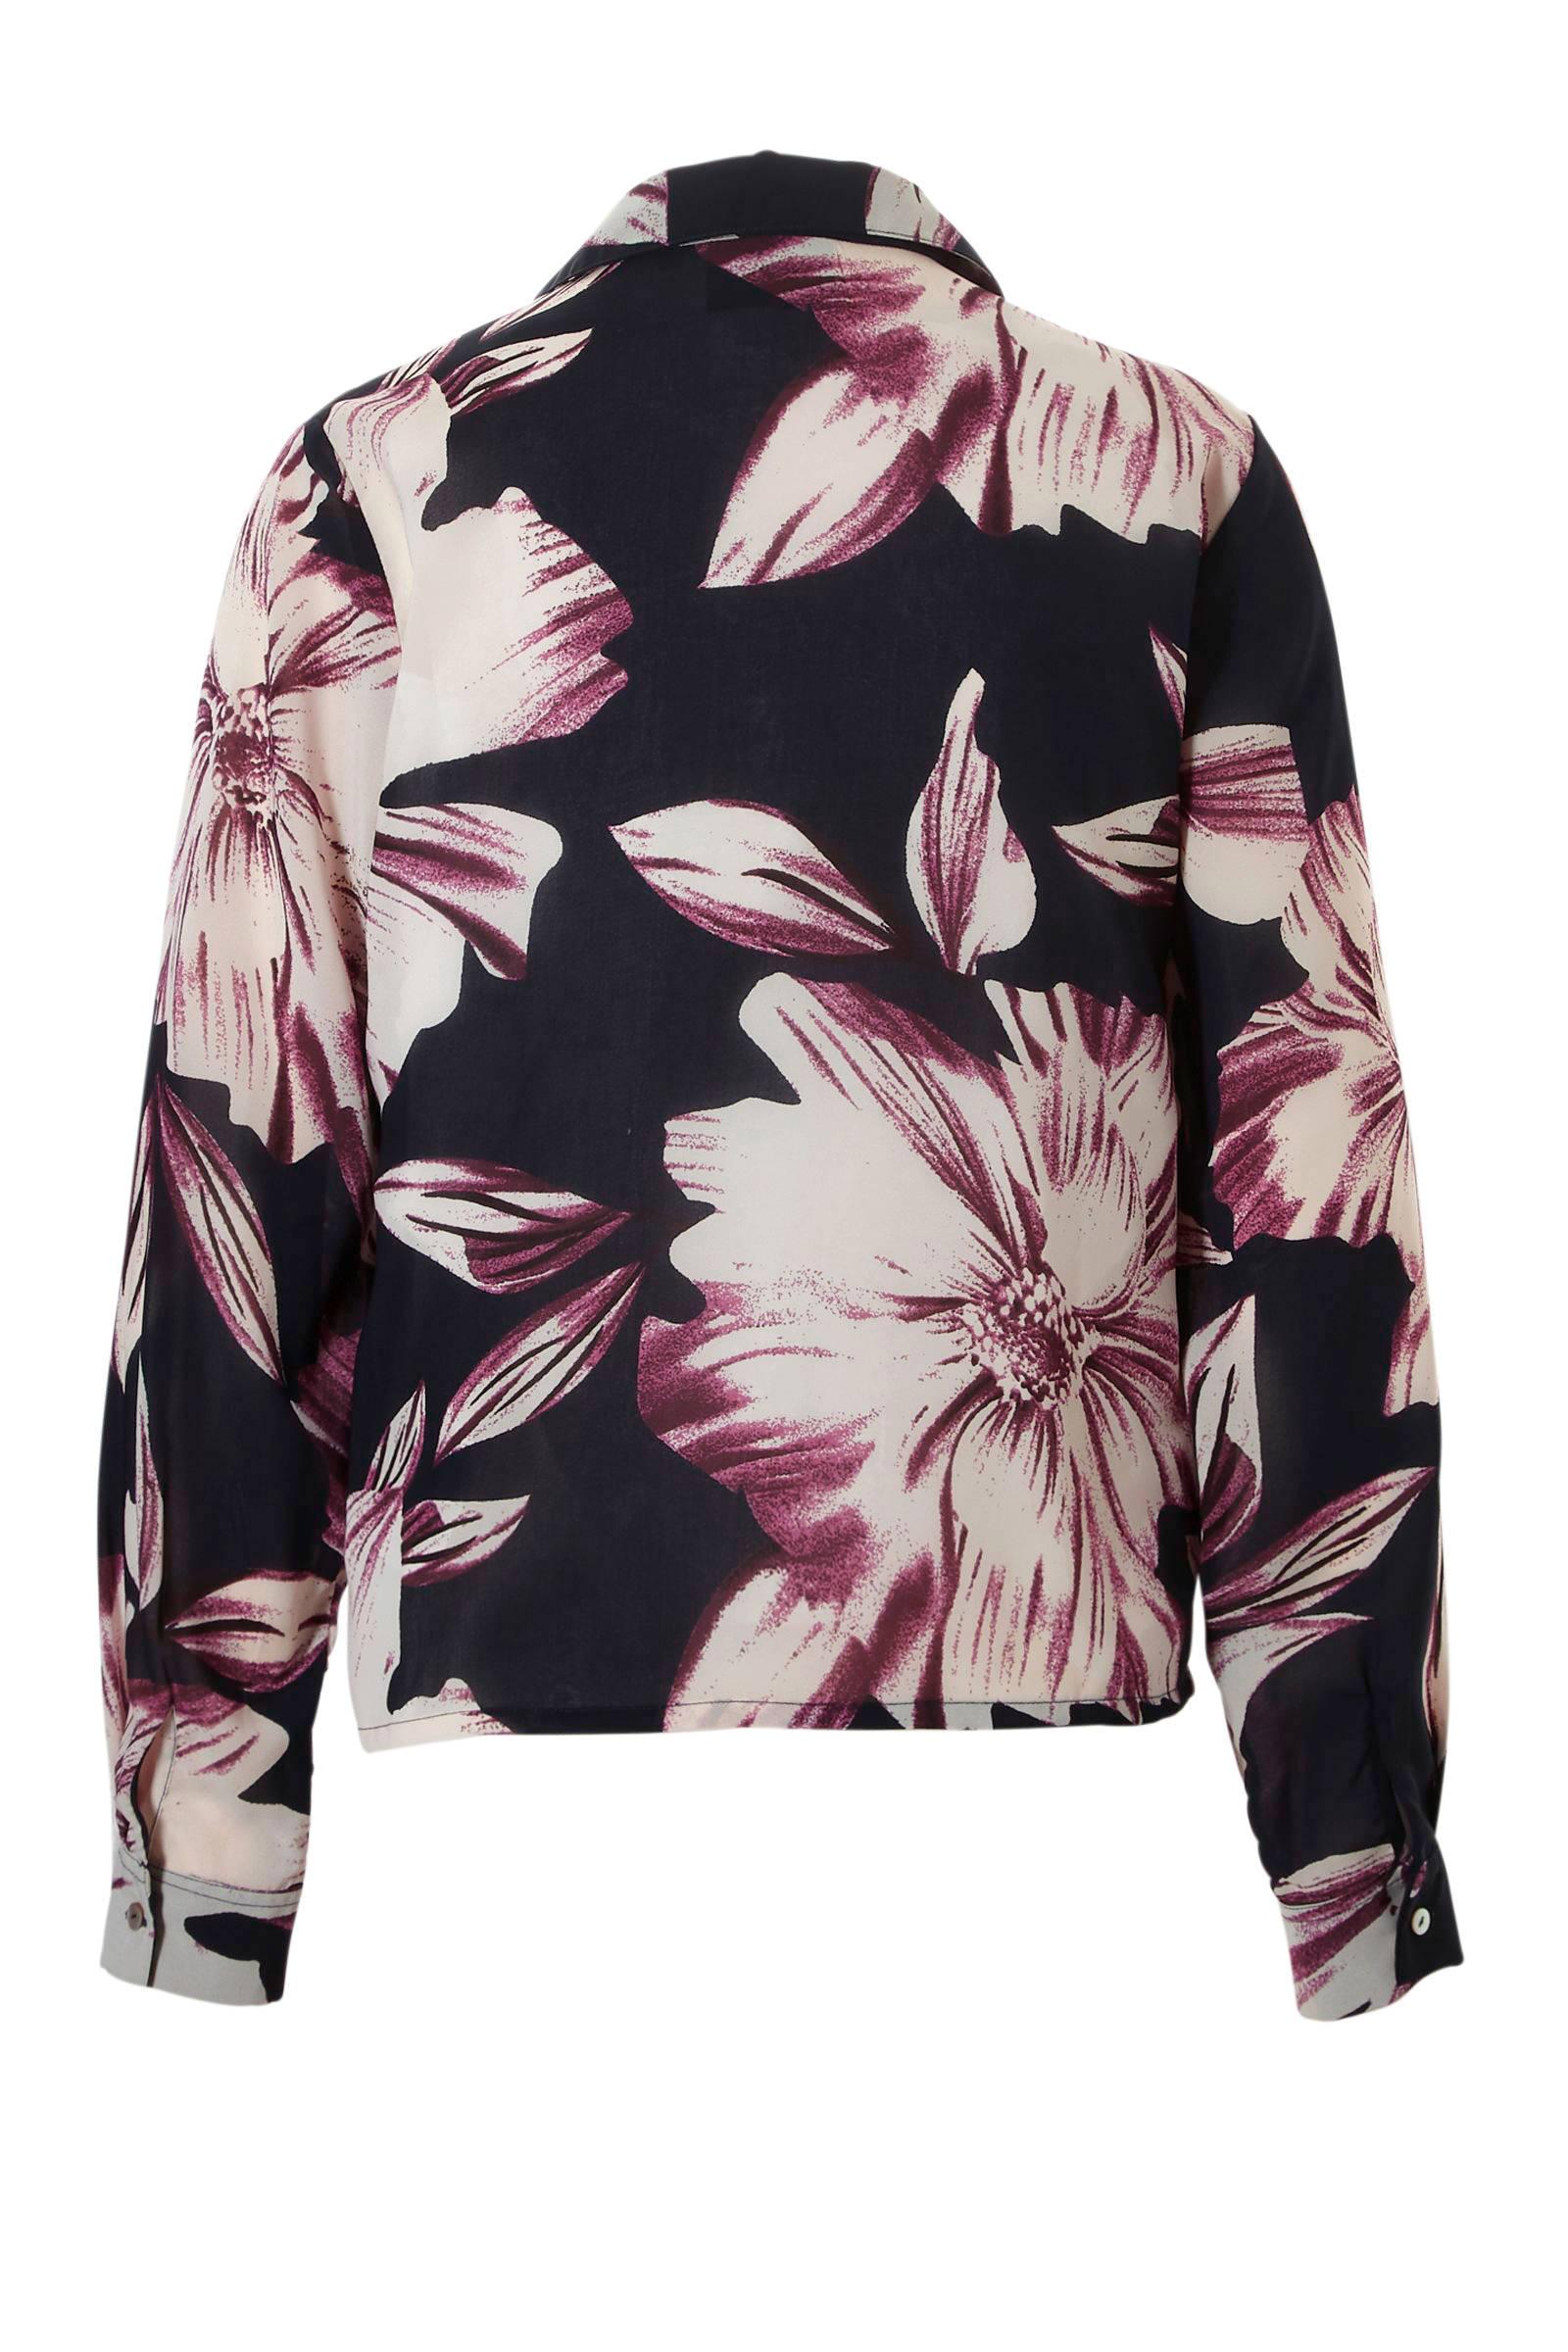 blouse OBJECT OBJECT blouse OBJECT bloemen met bloemen OBJECT blouse met met bloemen blouse twZxd5wO